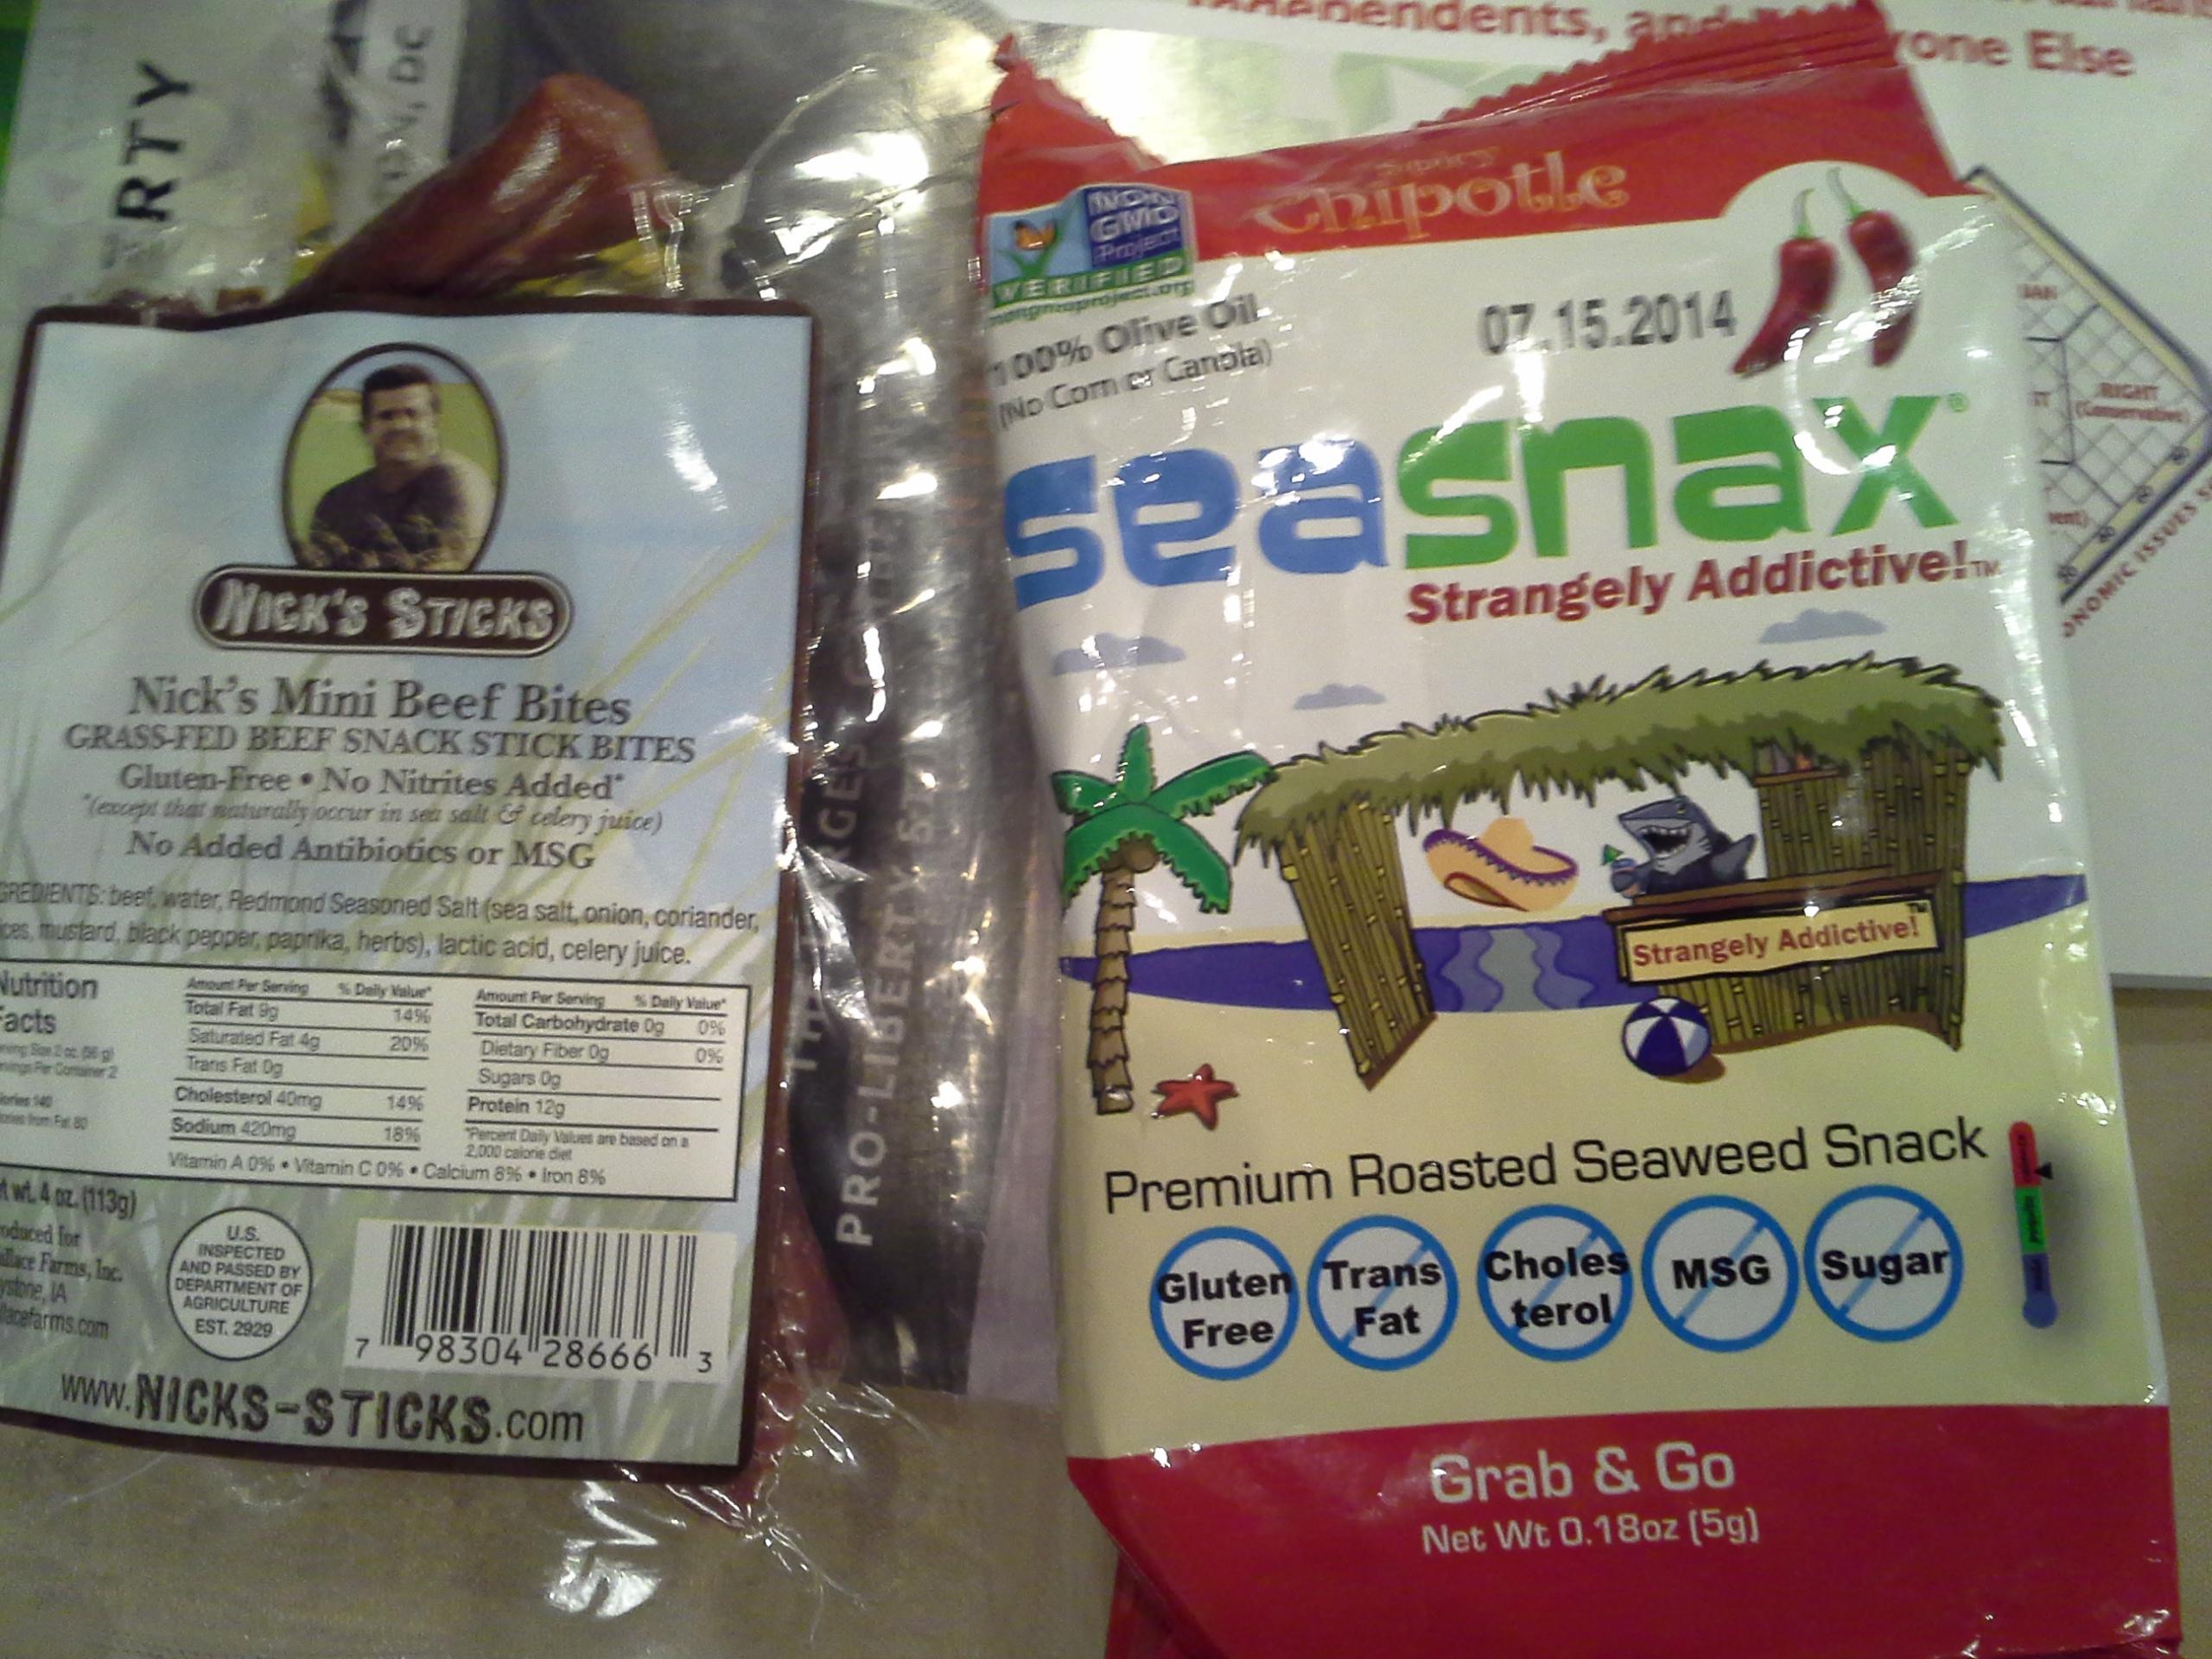 Snack: 7:15 p.m. | 4 oz. beef sticks, .18 oz. chipotle SeaSnax seaweed